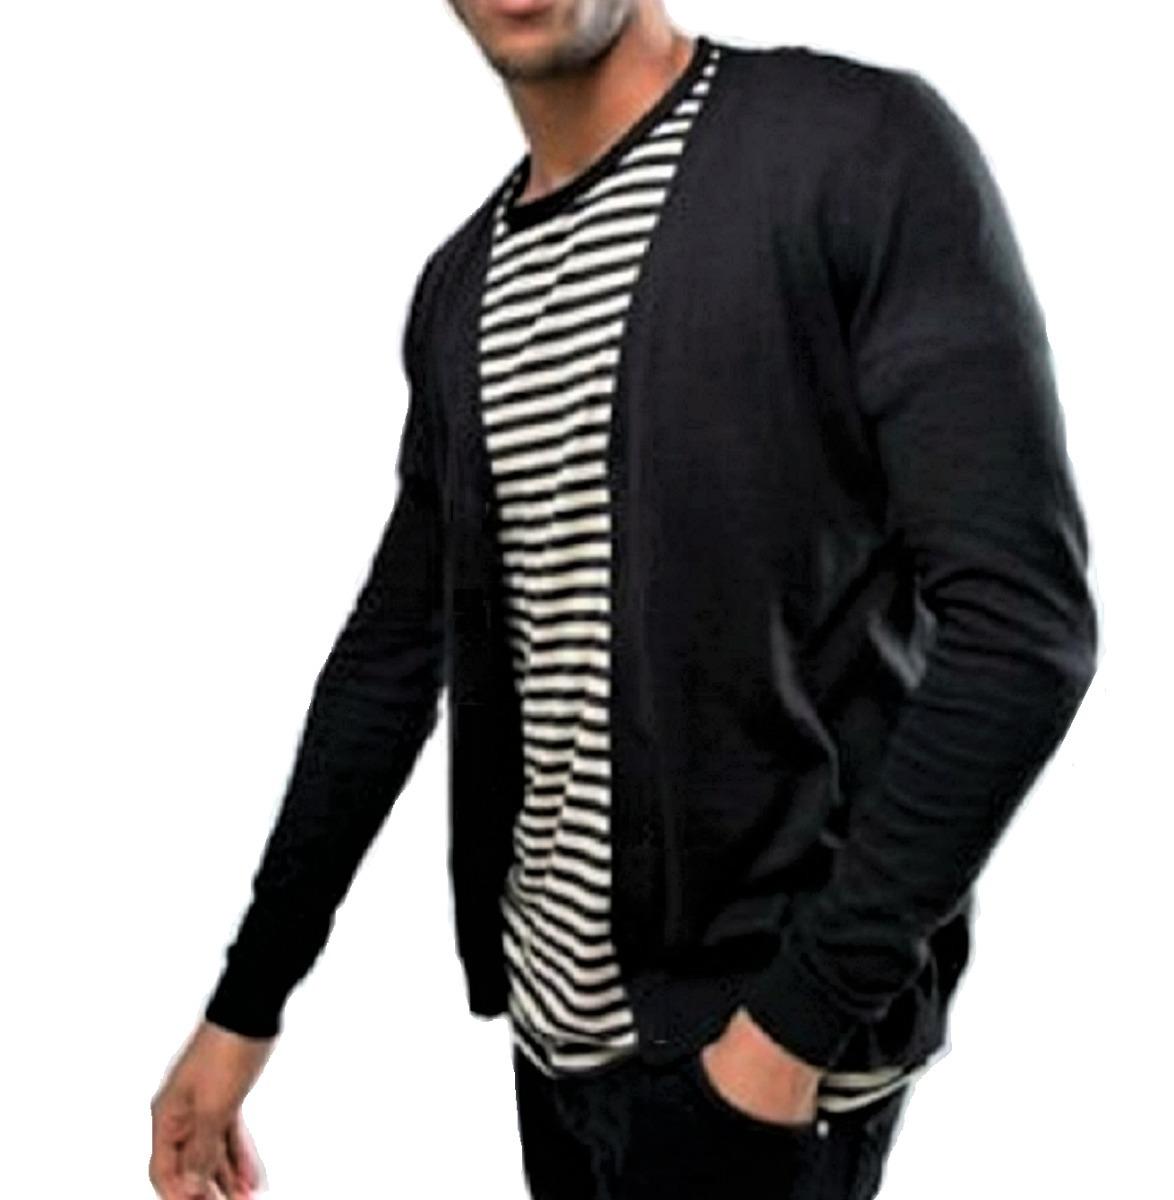 22f747f2f Casaco Cardigan Calvin Klein Masculino - R$ 249,90 em Mercado Livre